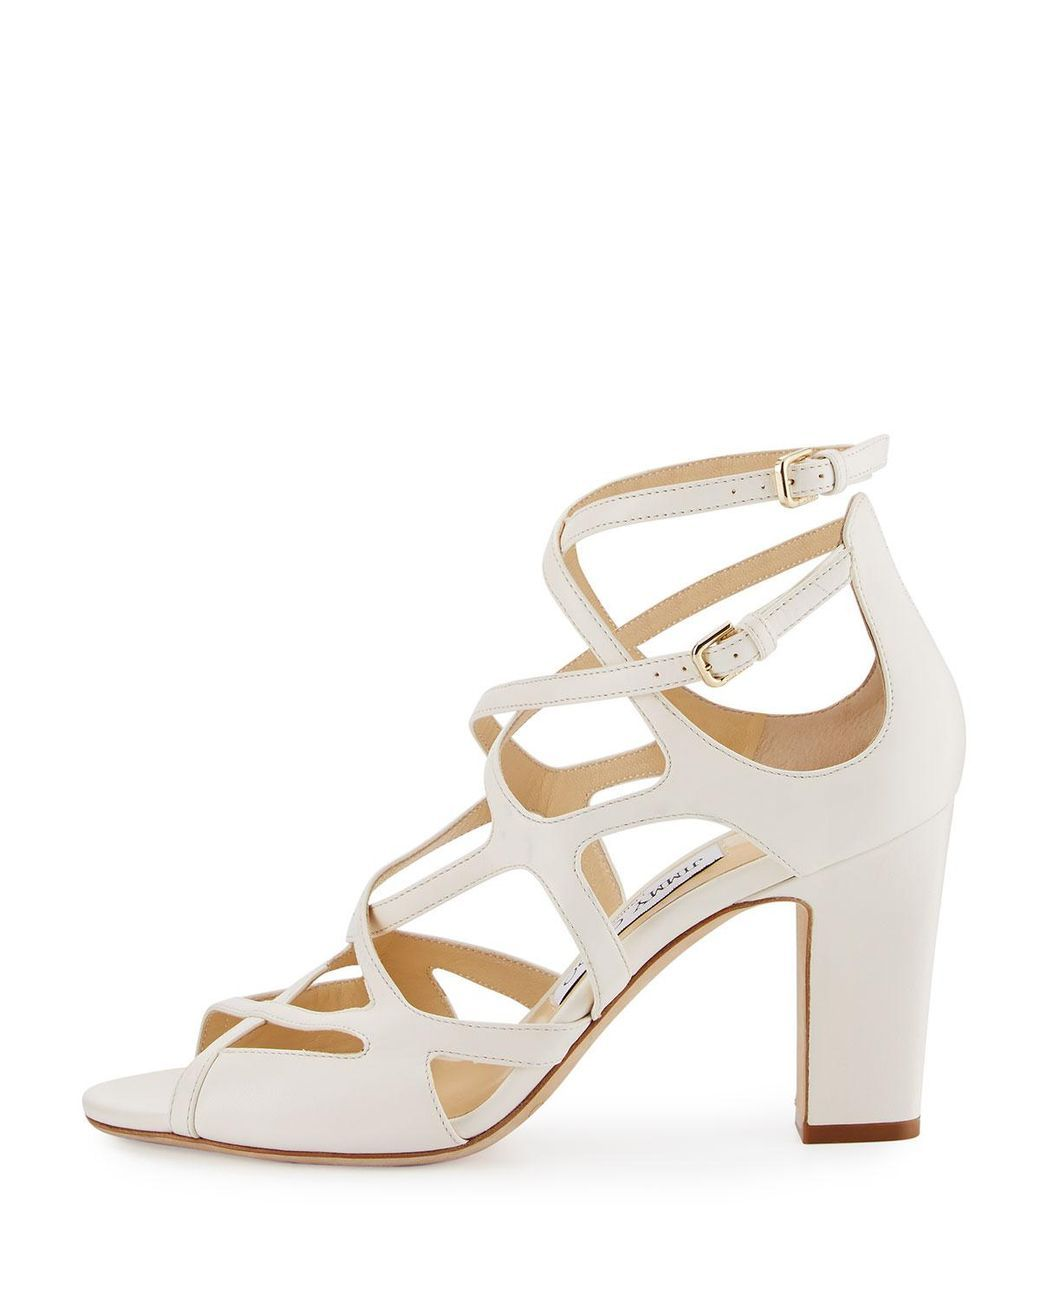 Jimmy choo Slip on block heel sandals Sale Cheap Price RWGgw